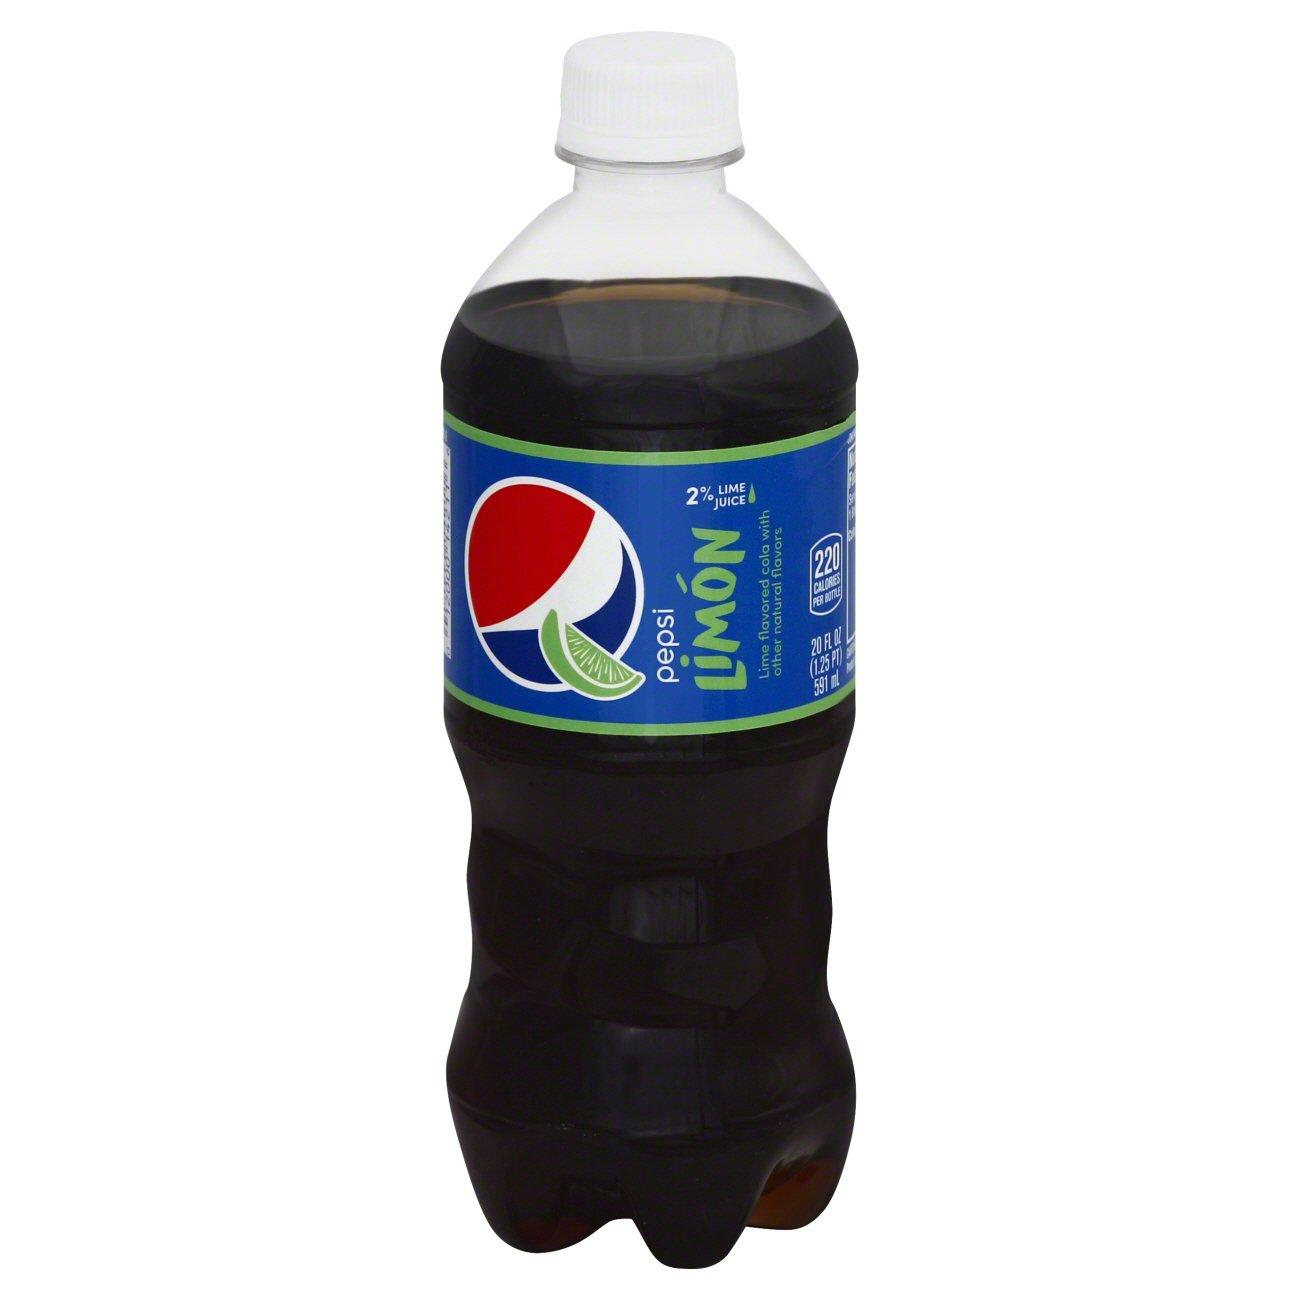 Pepsi Limon Soda - Shop Soft Drinks at HEB